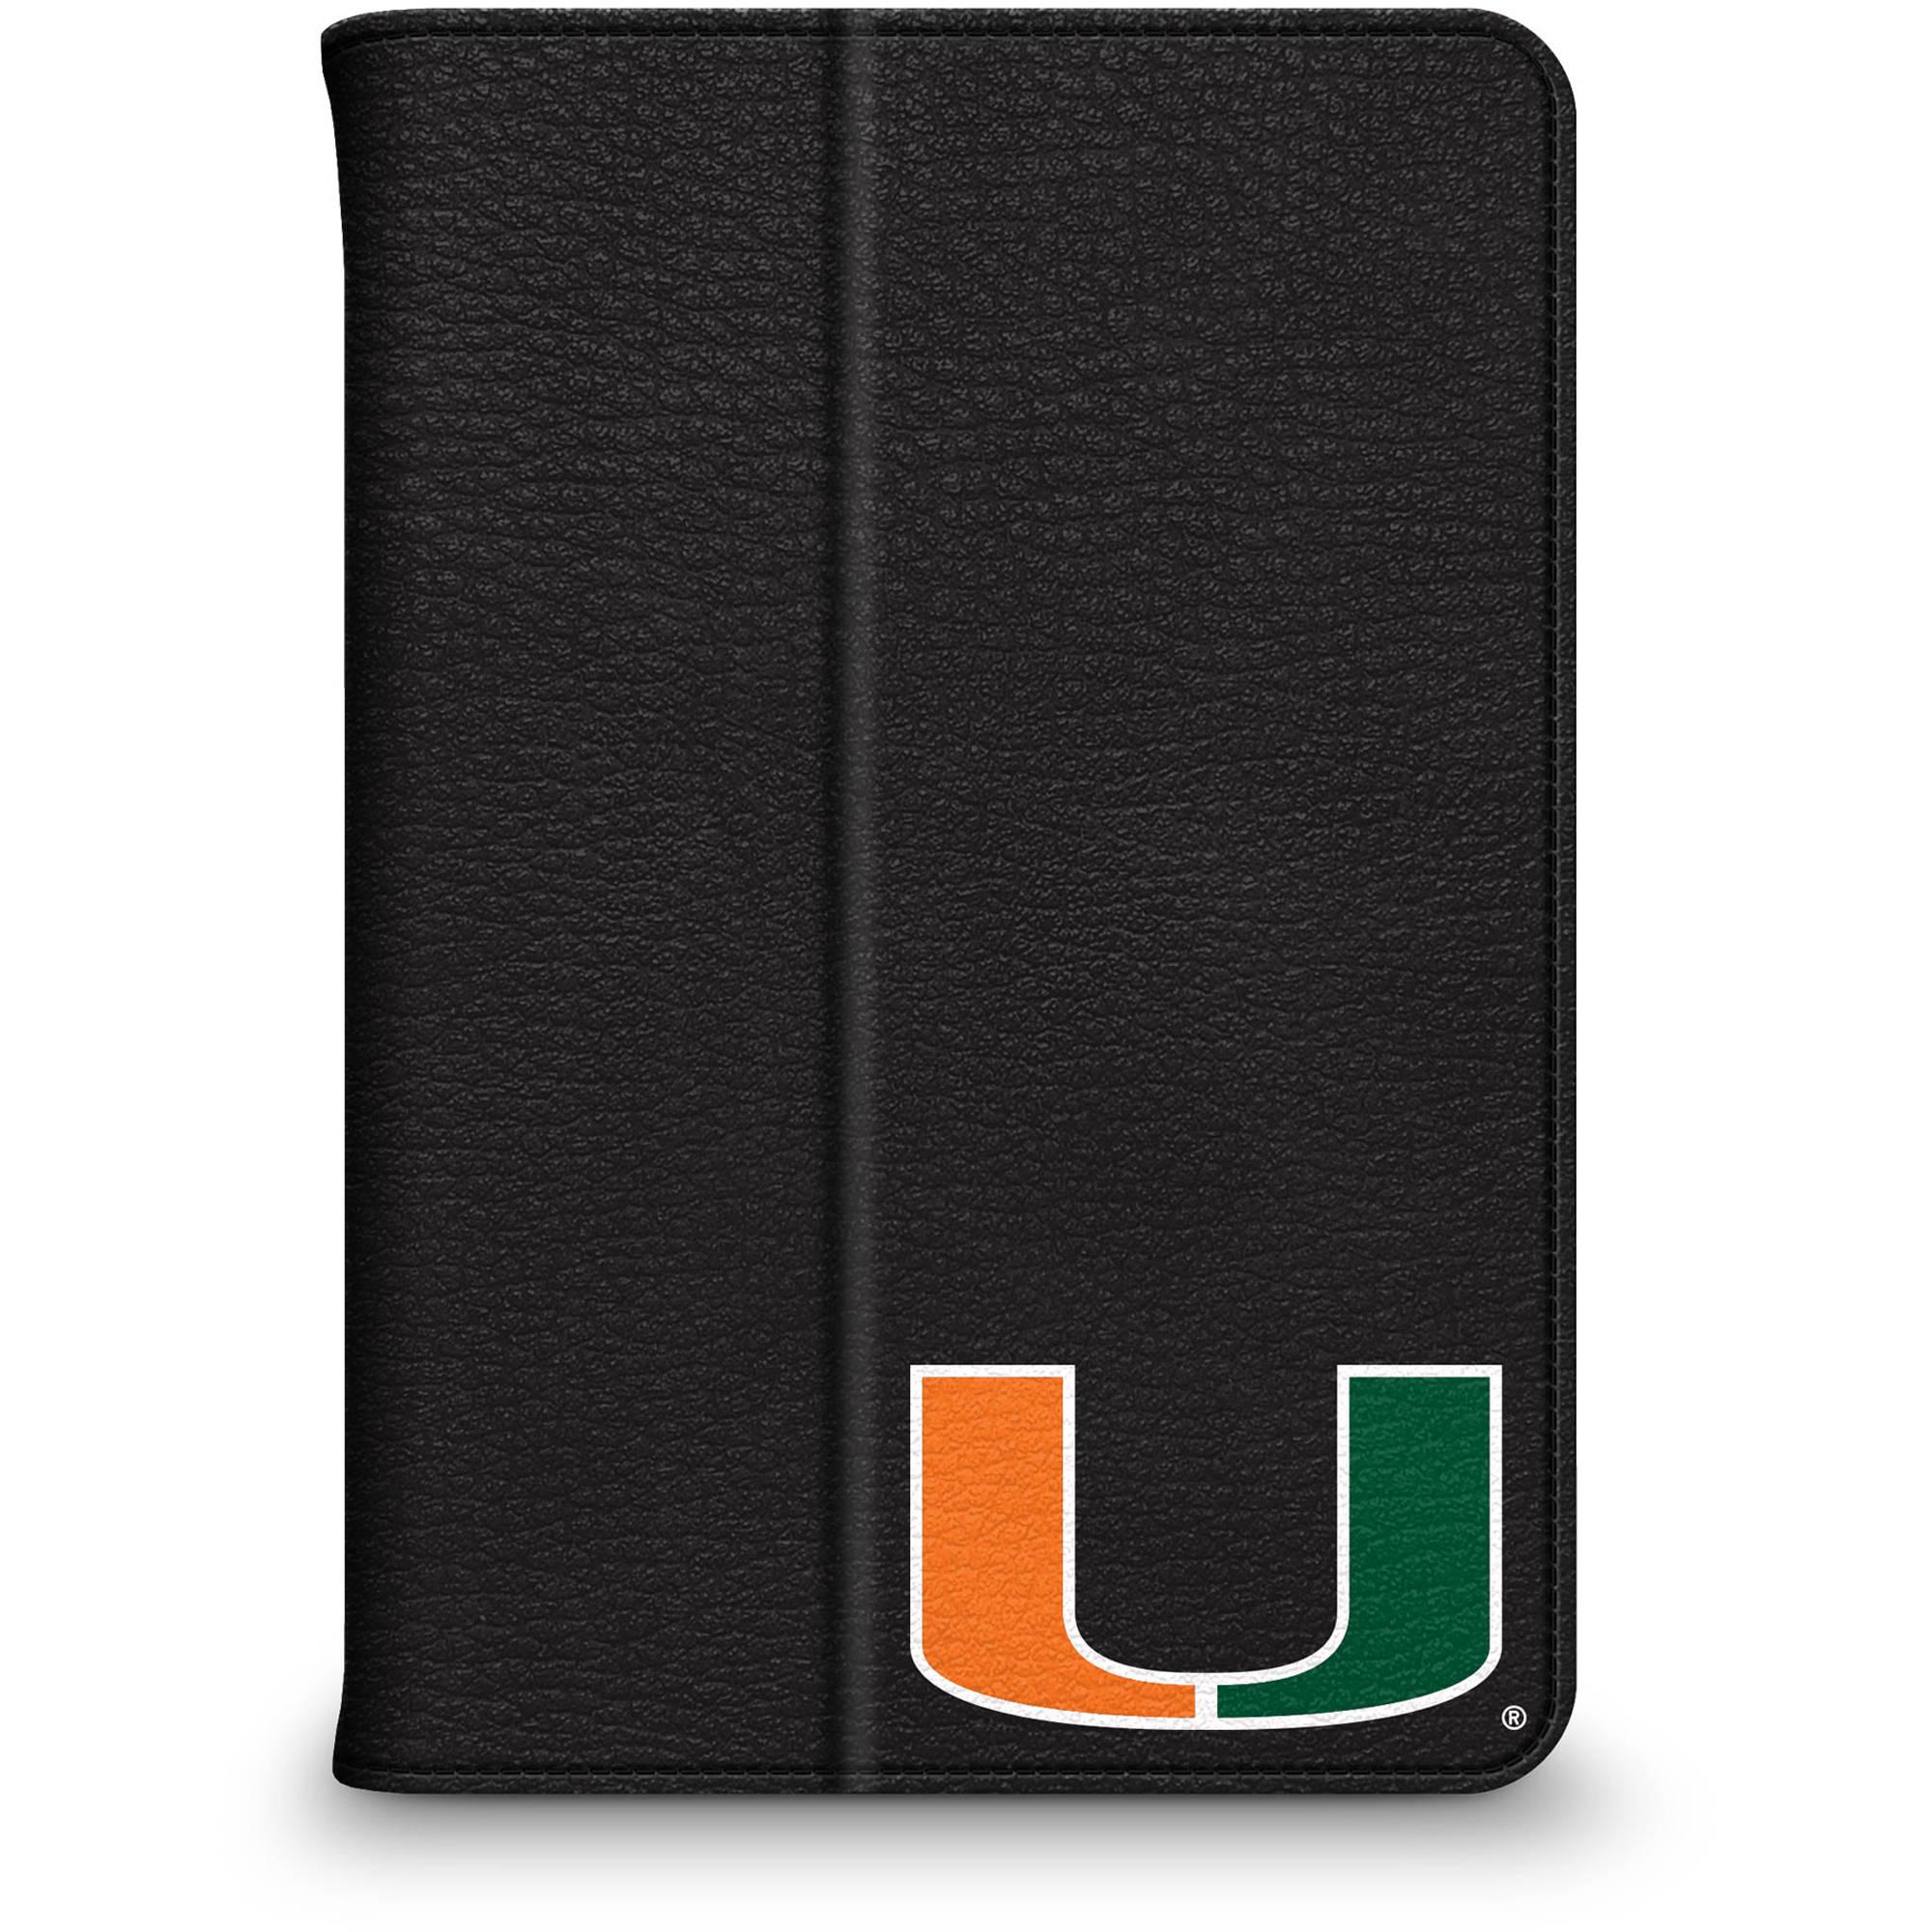 Apple iPad mini Leather Folio Case, University of Miami